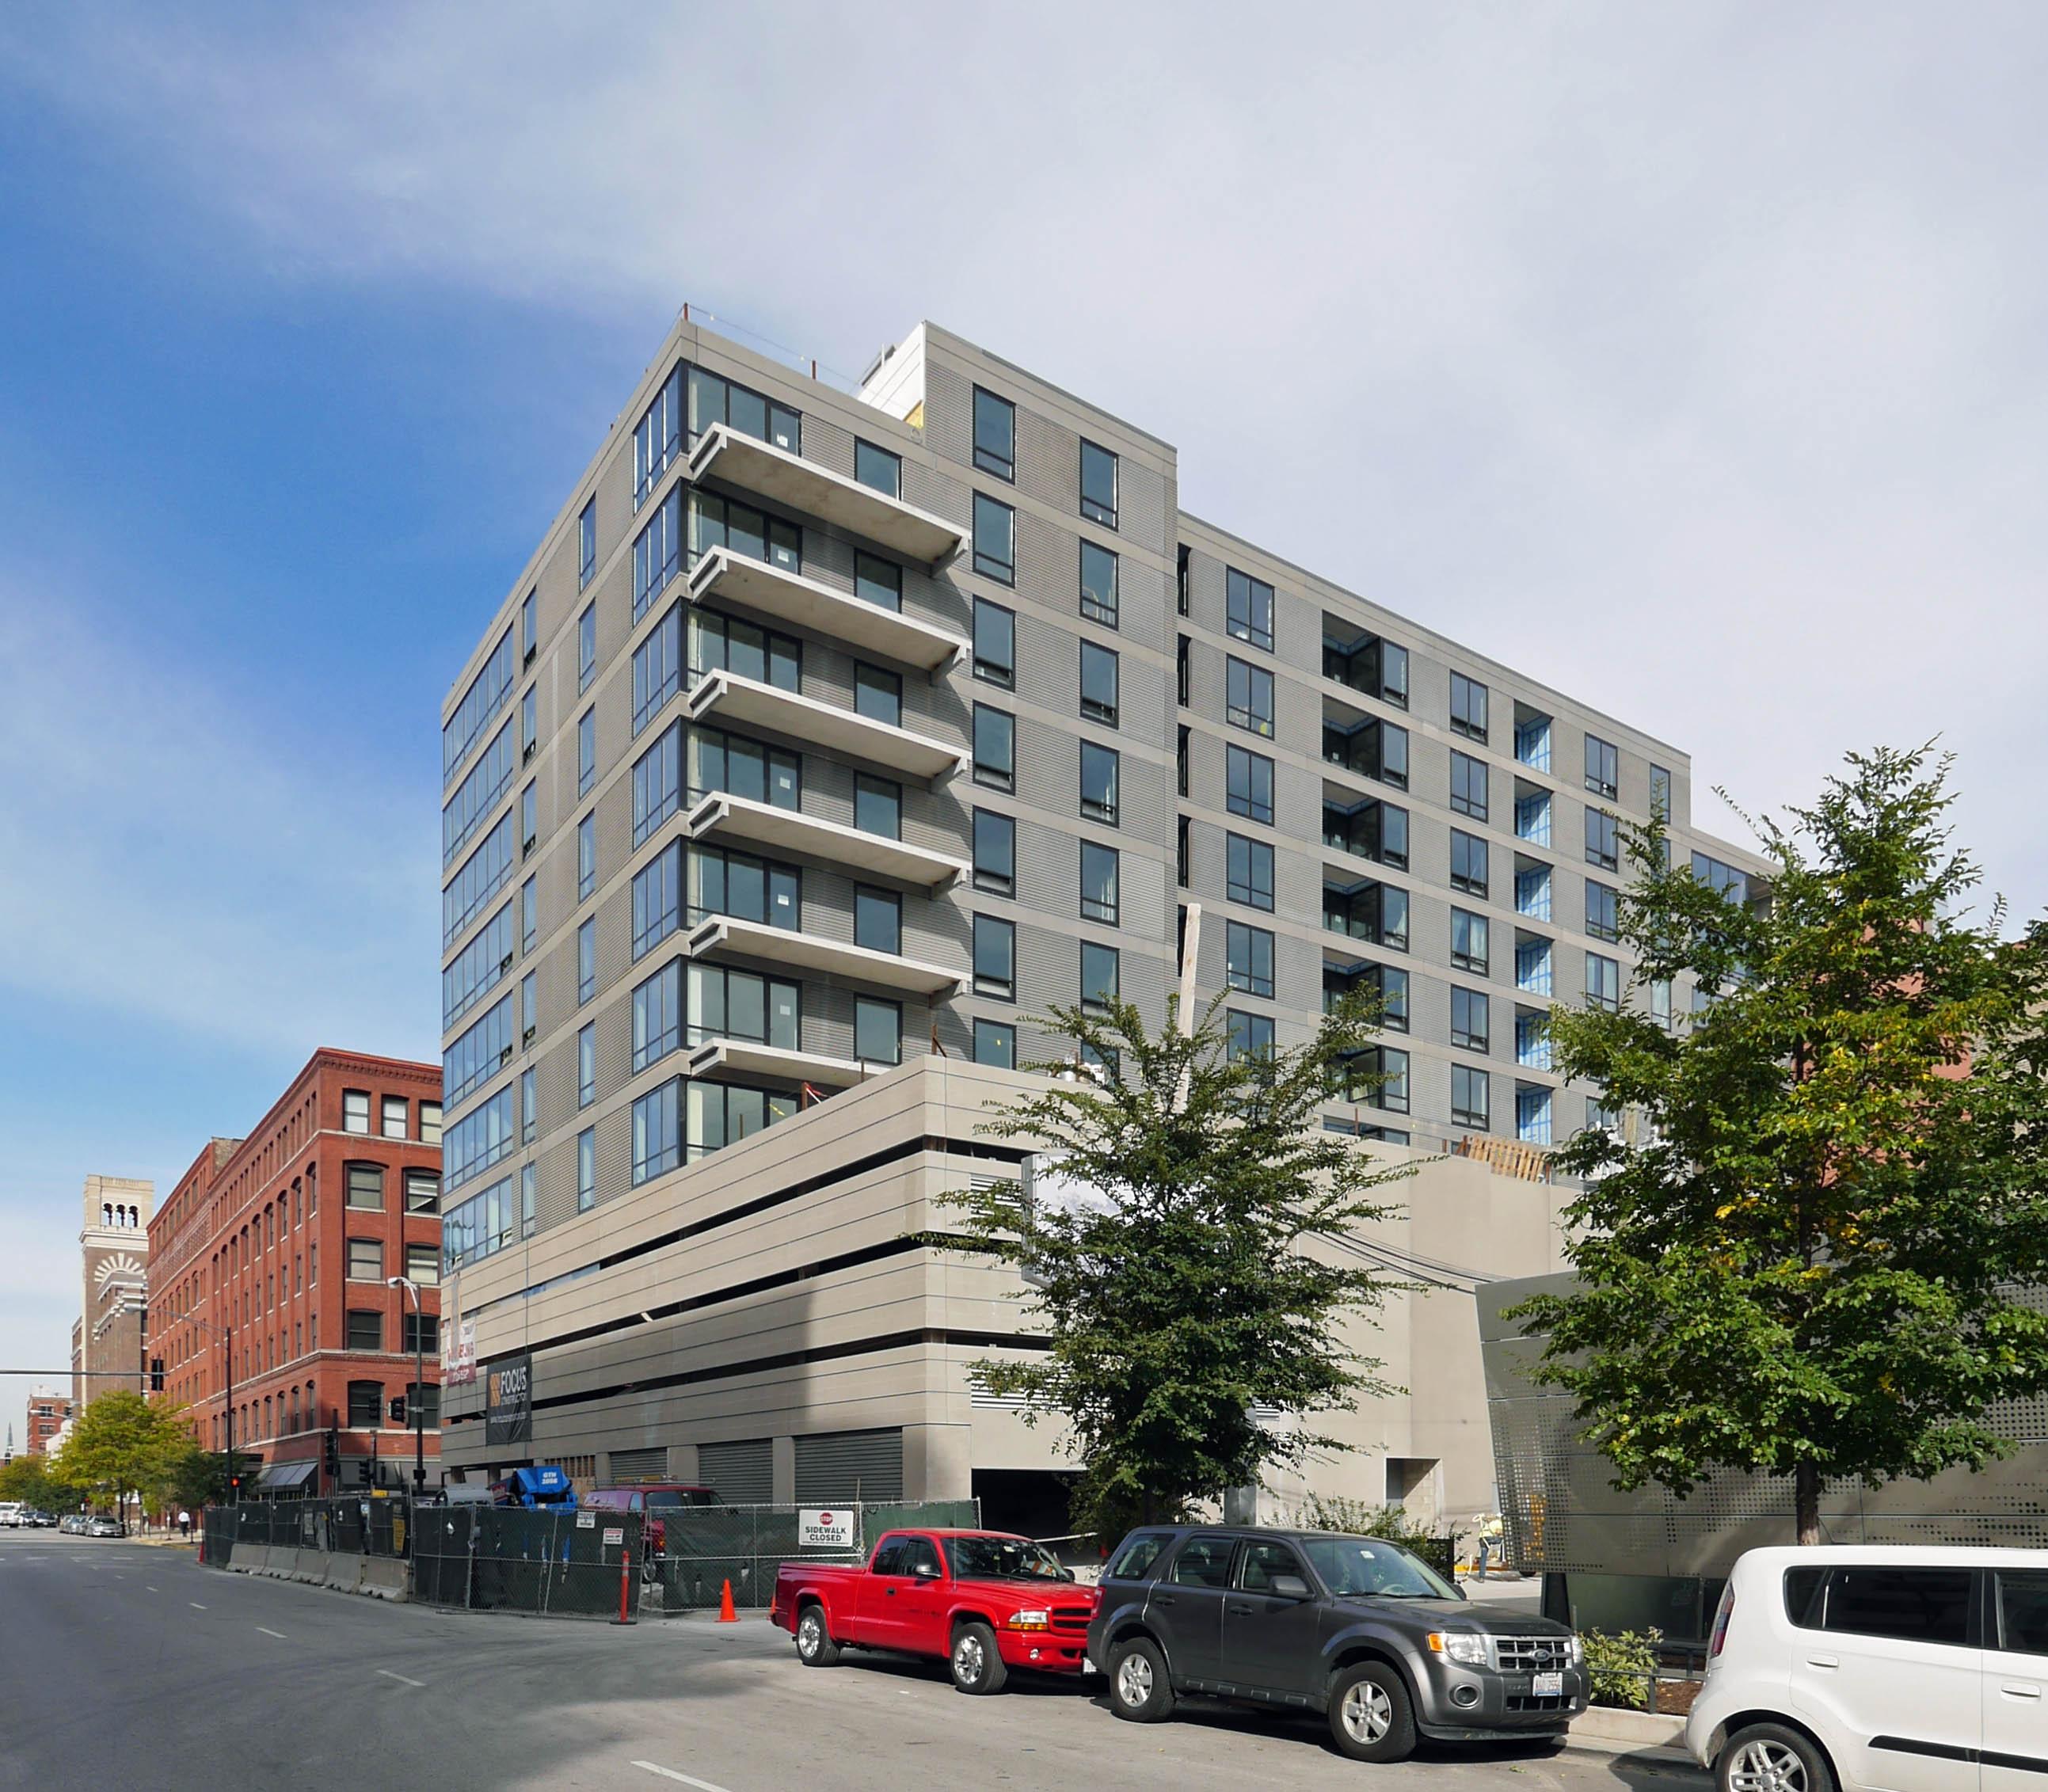 Circa 922 Apartments, 922 W Washington St, West Loop